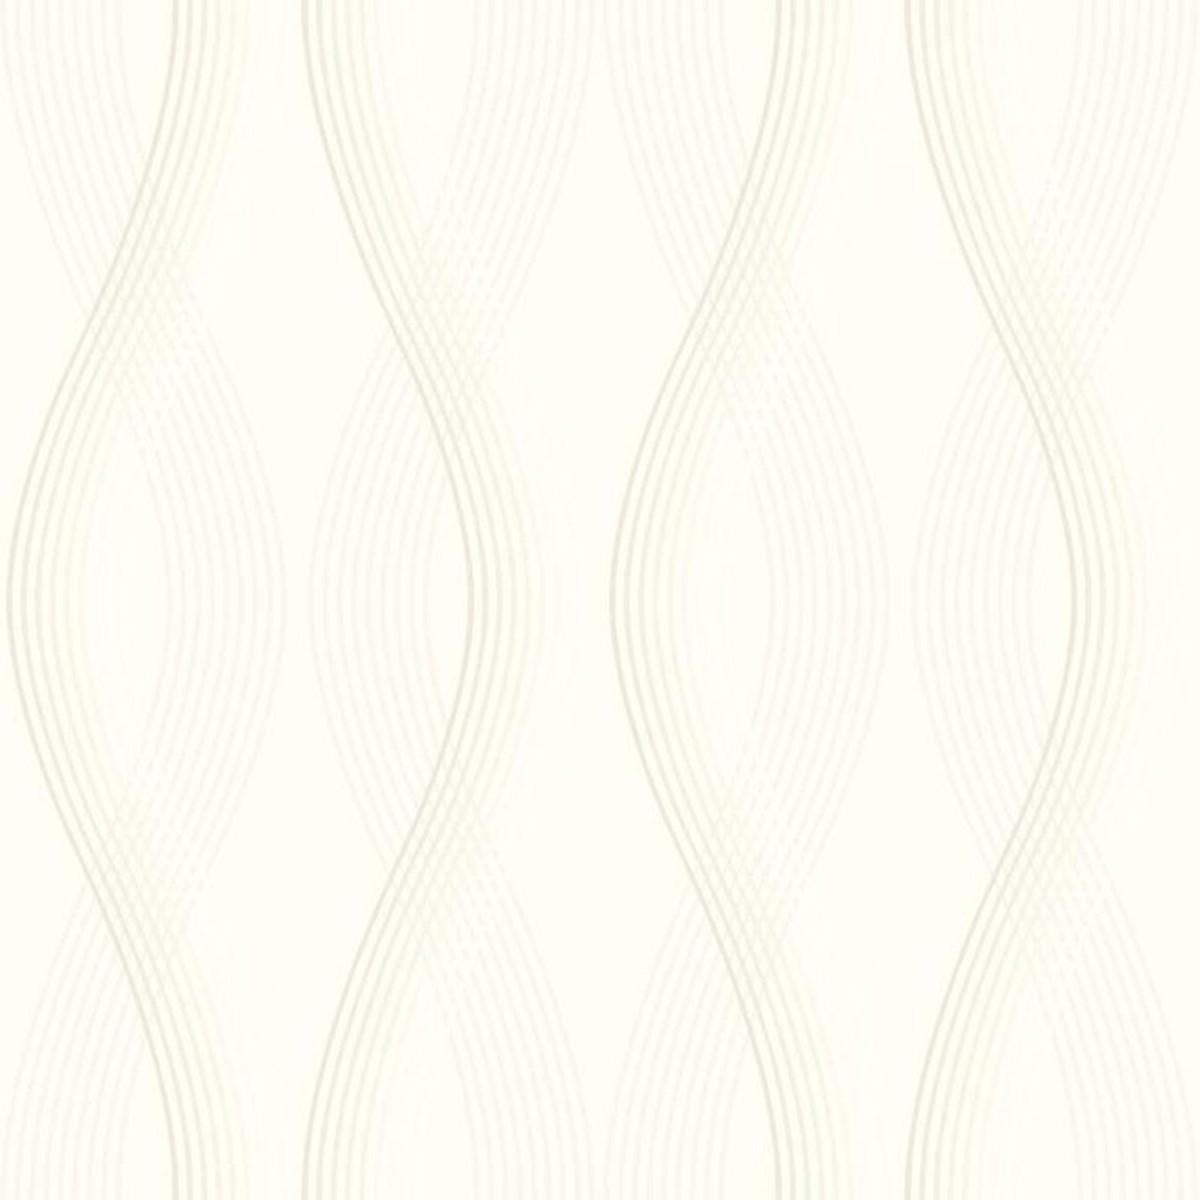 Обои флизелиновые Decoprint Paradisio бежевые 0.53 м PA16840